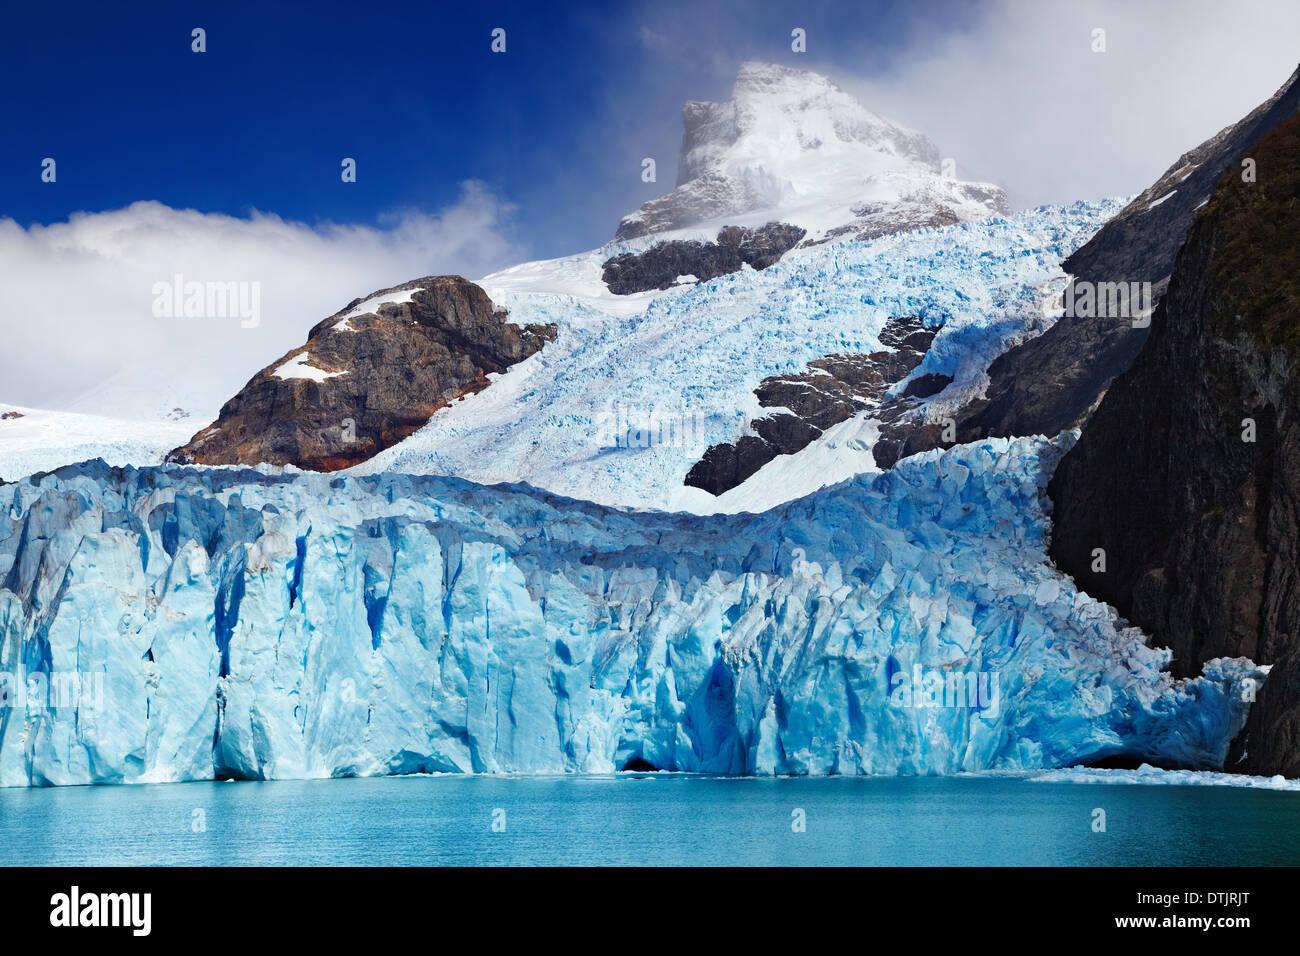 El Glaciar Spegazzini, Lago Argentino, Patagonia, Argentina Foto de stock